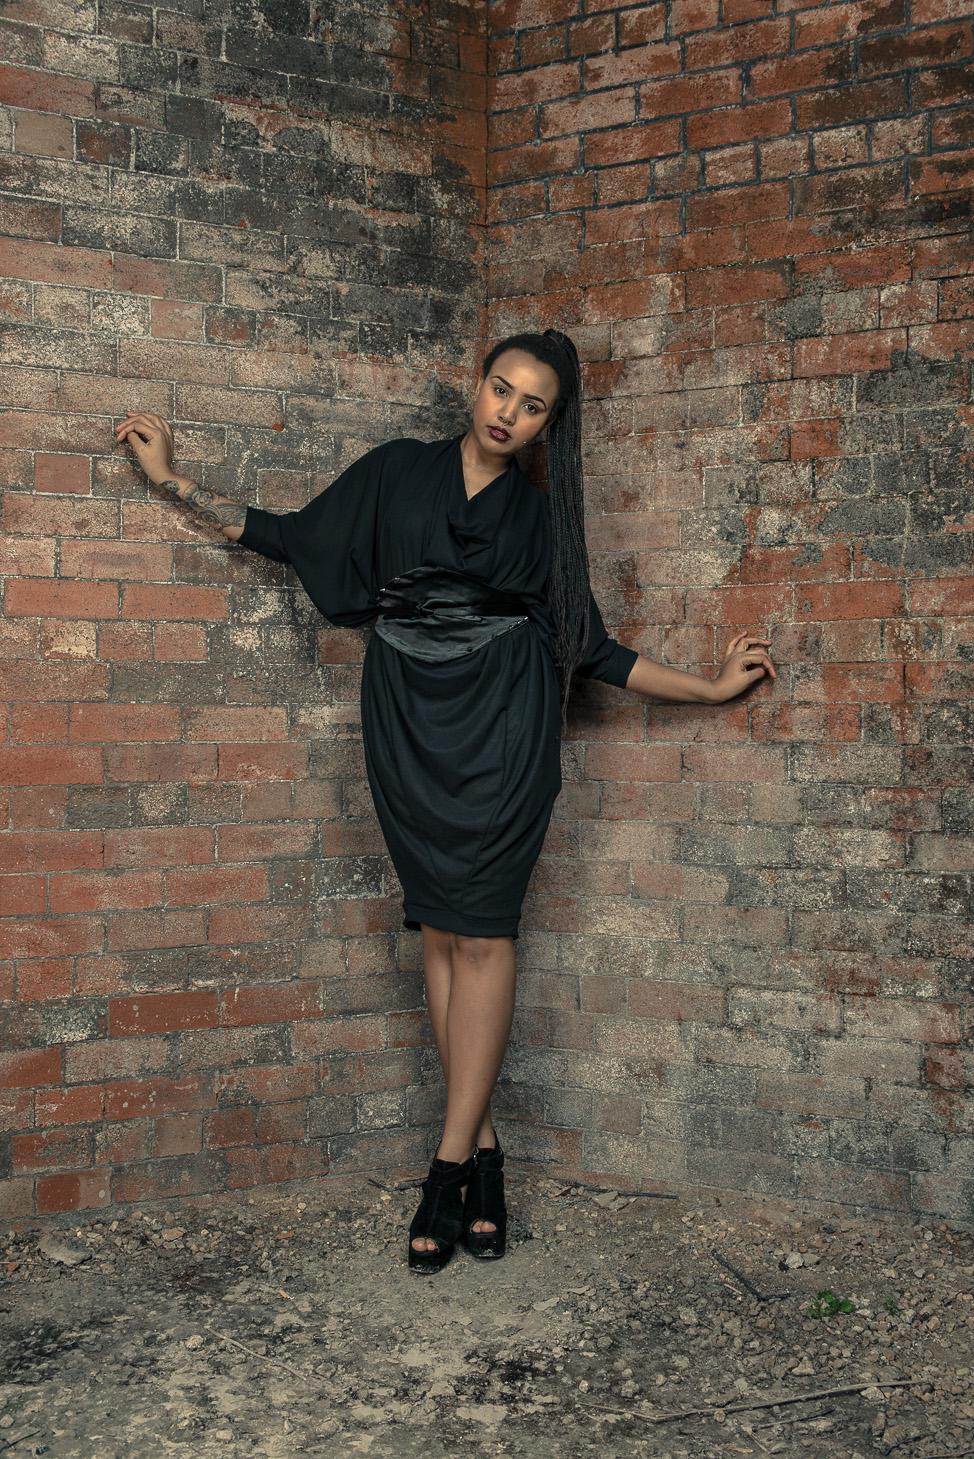 zaramia-ava-zaramiaava-leeds-fashion-designer-ethical-sustainable-tailored-minimalist-aya-dress-versatile-drape-black-belt-wrap-cowl-styling-womenswear-models-photoshoot-location-15